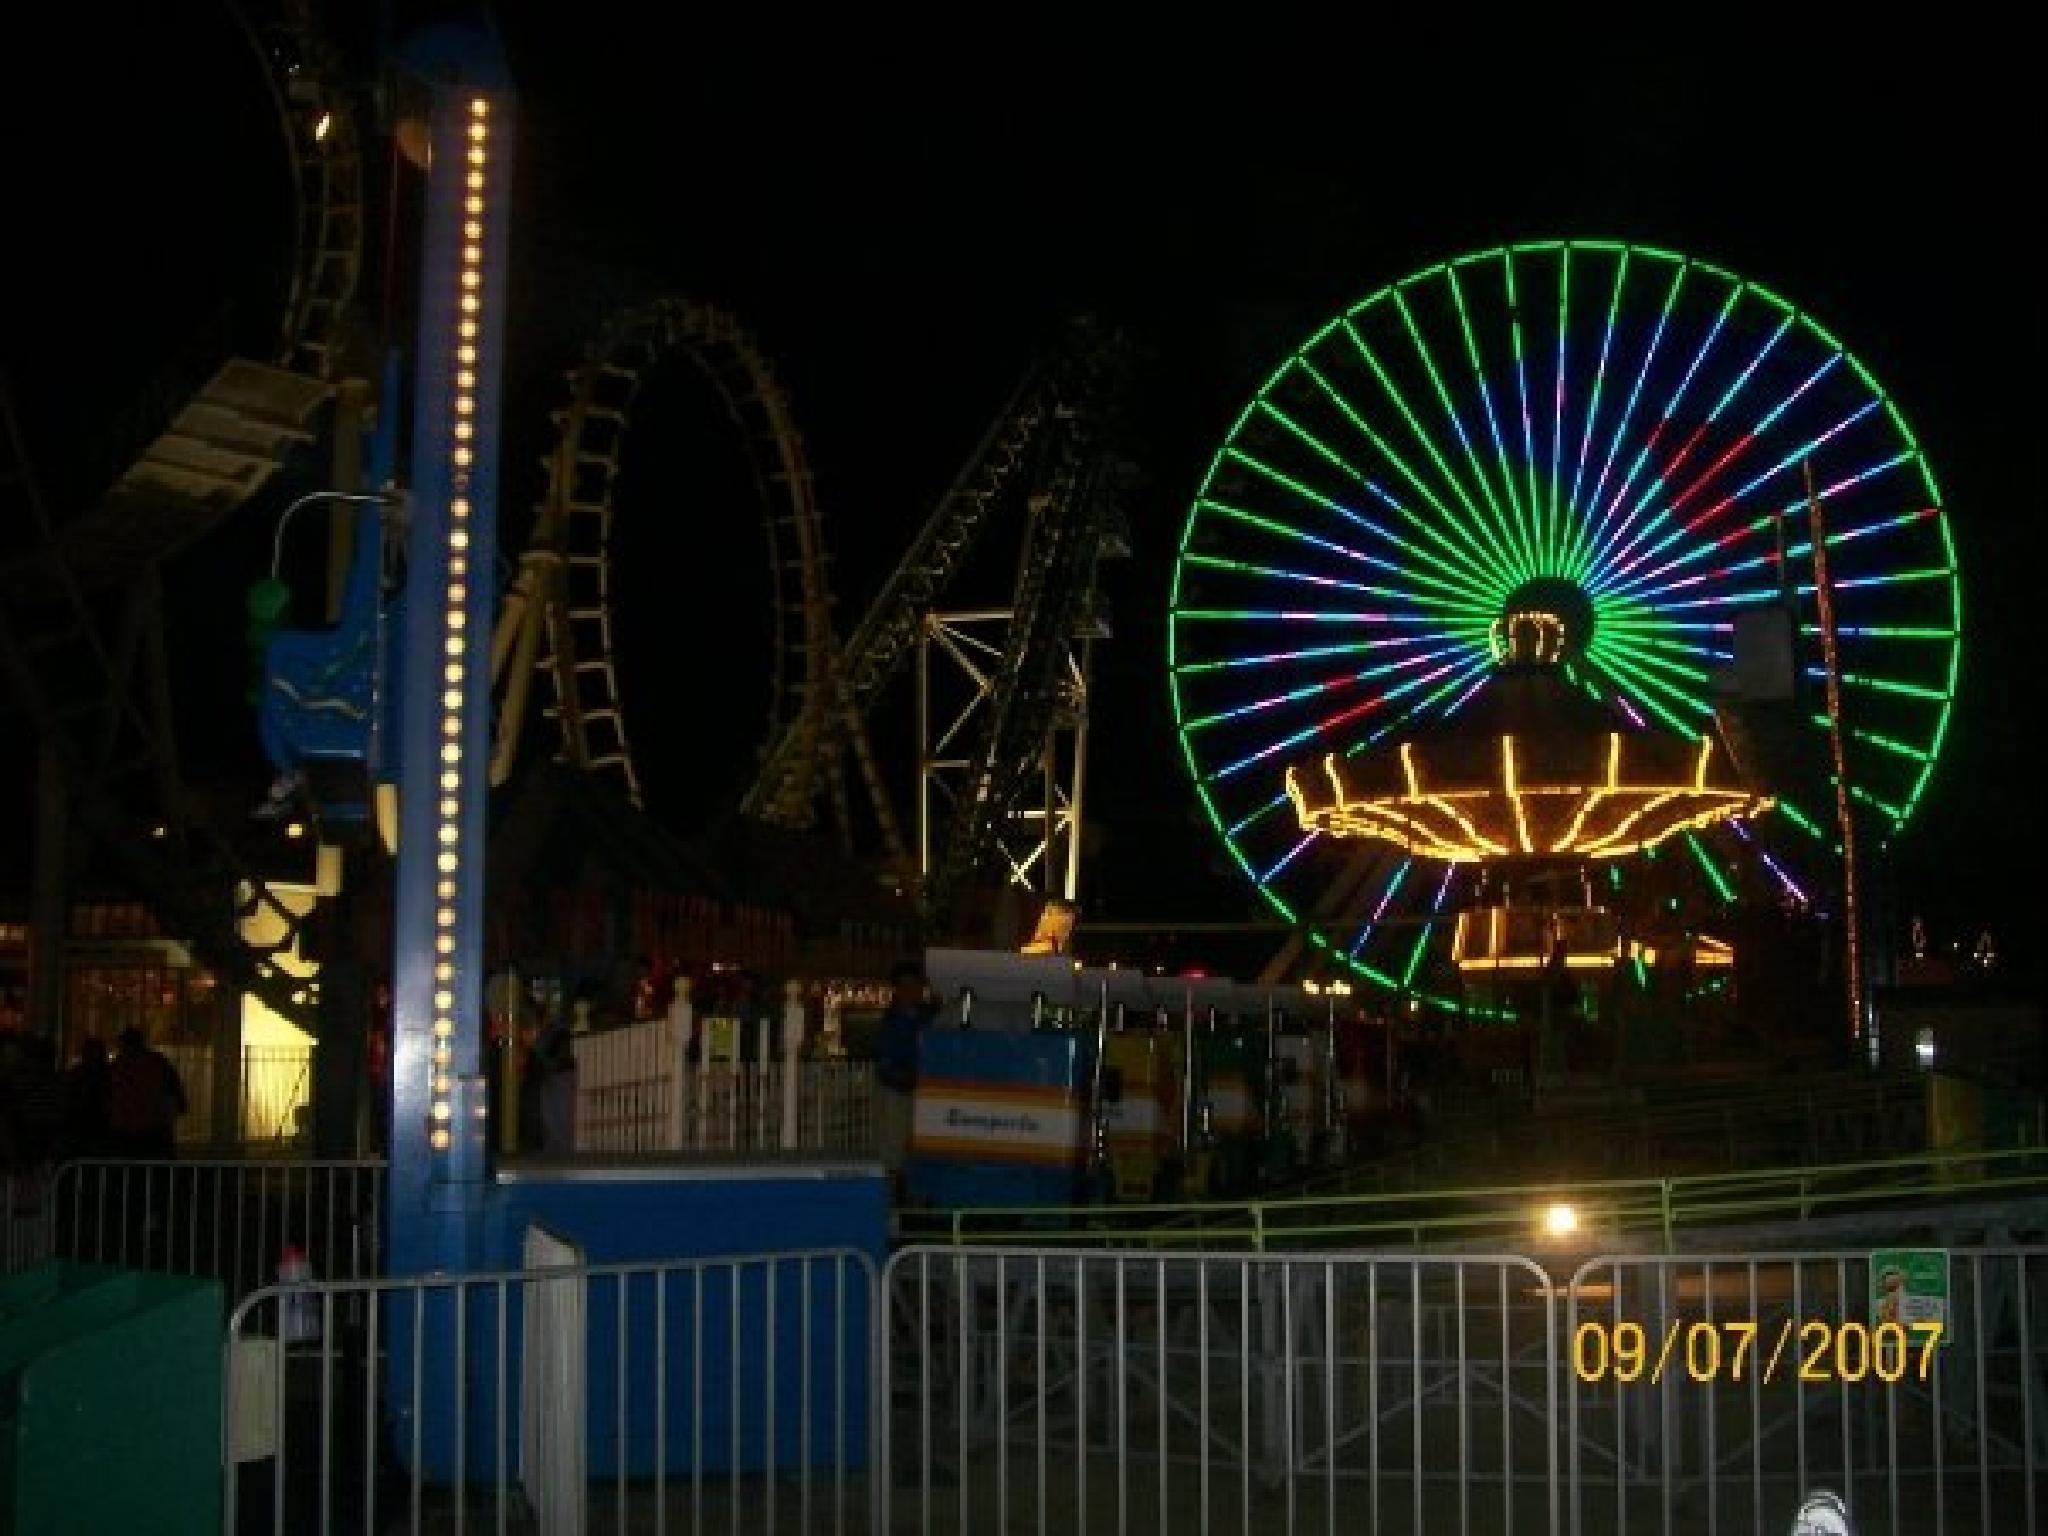 Amusement Park, Wildwood, NJ by philipanthonyreilly